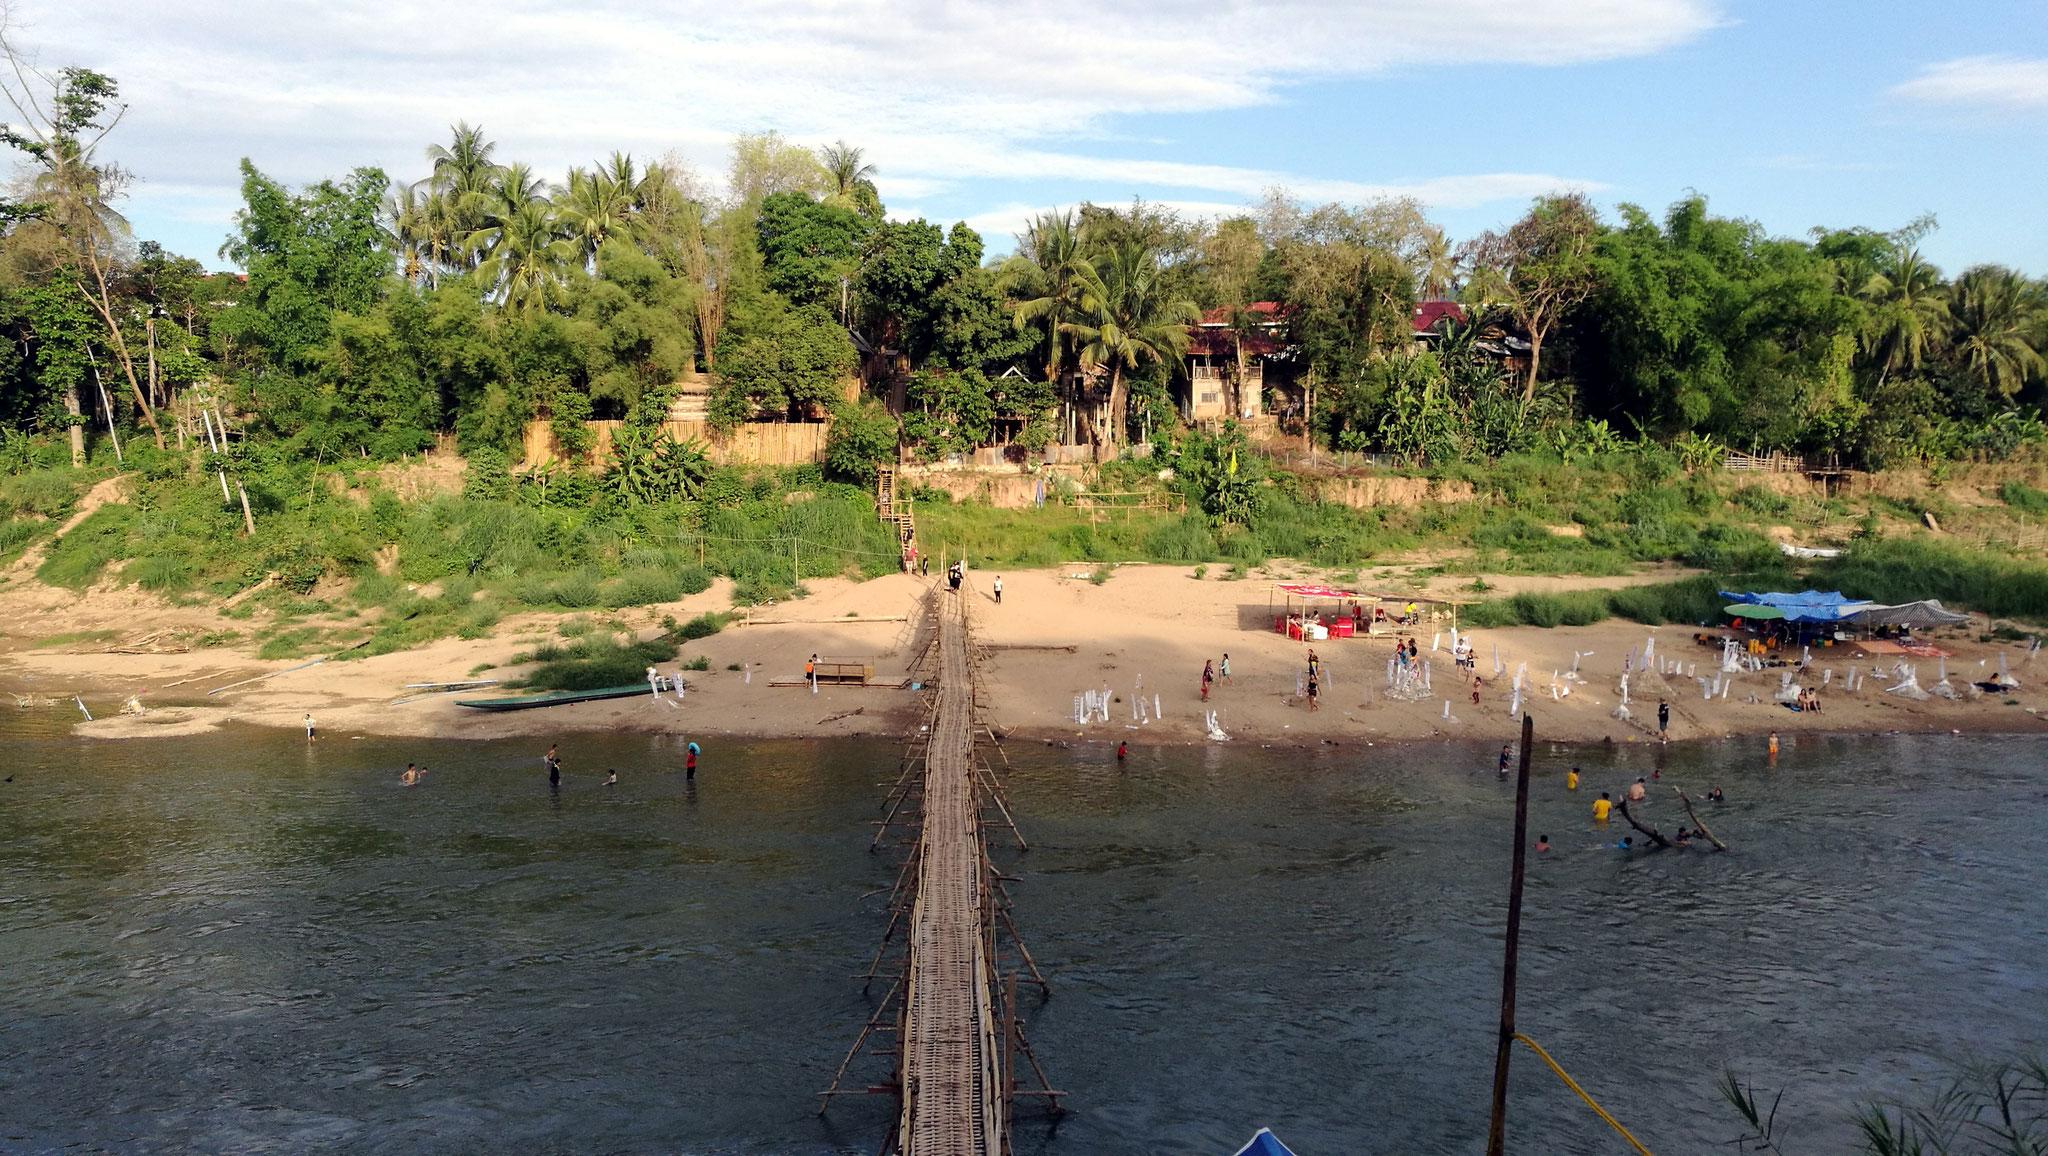 Perspektivwechsel - Tropenathmosphäre in Luang Prabang